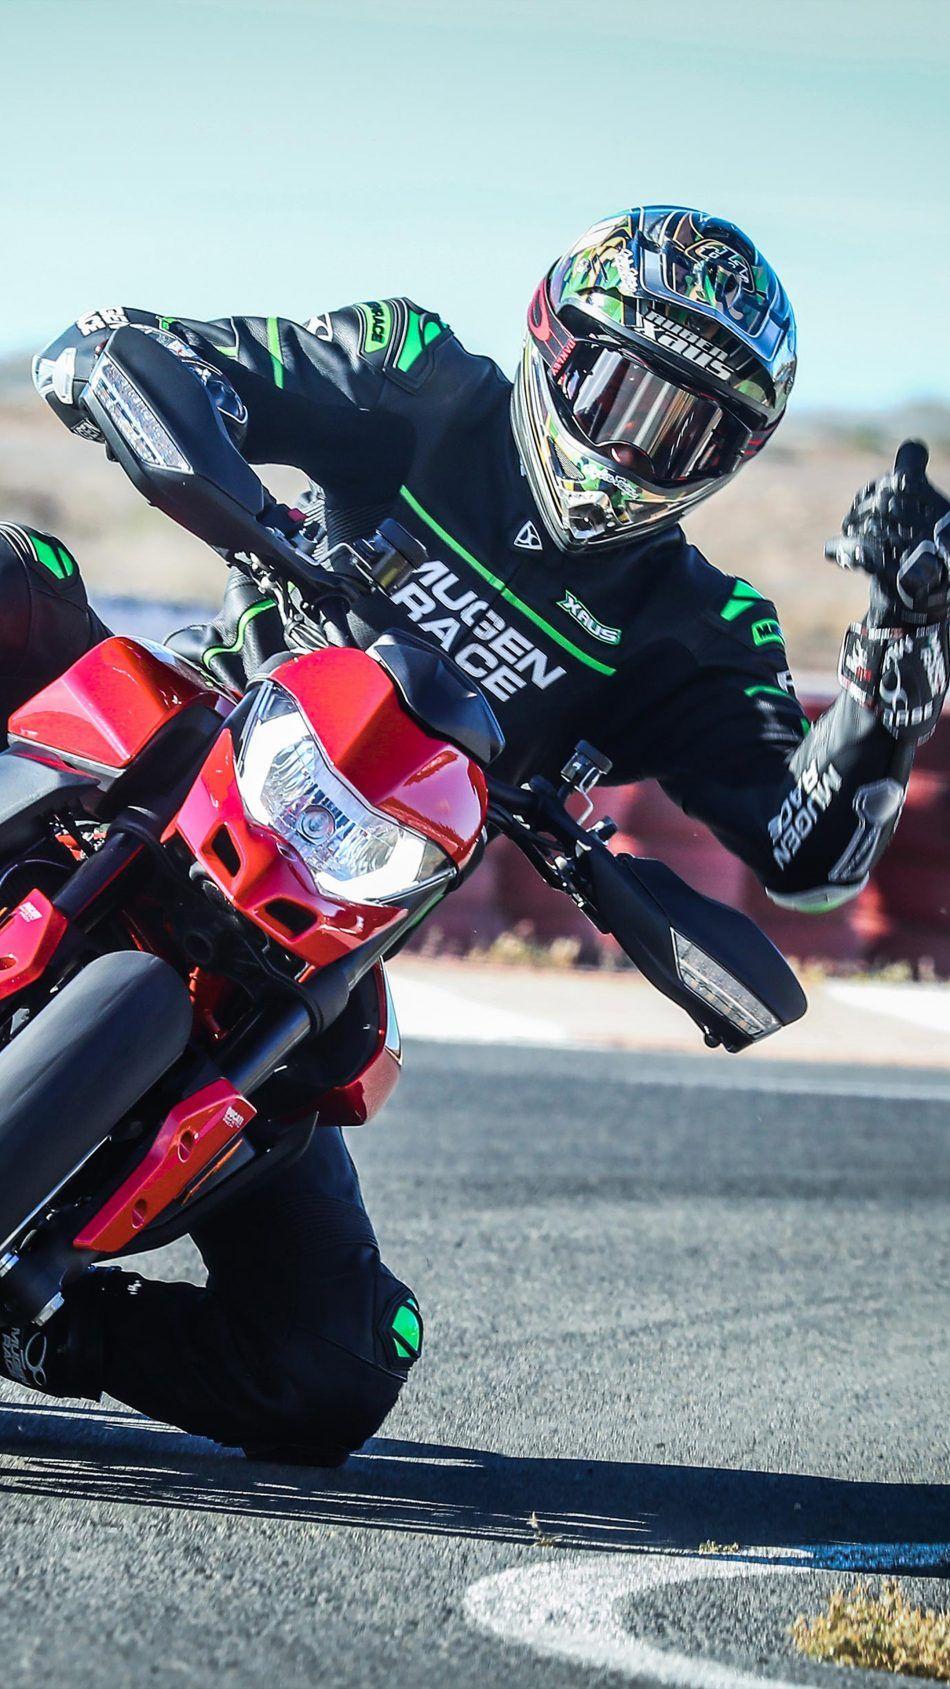 Ducati Hypermotard 950 4k Ultra Hd Mobile Wallpaper Ducati Hypermotard Ducati Ducati Motorcycles